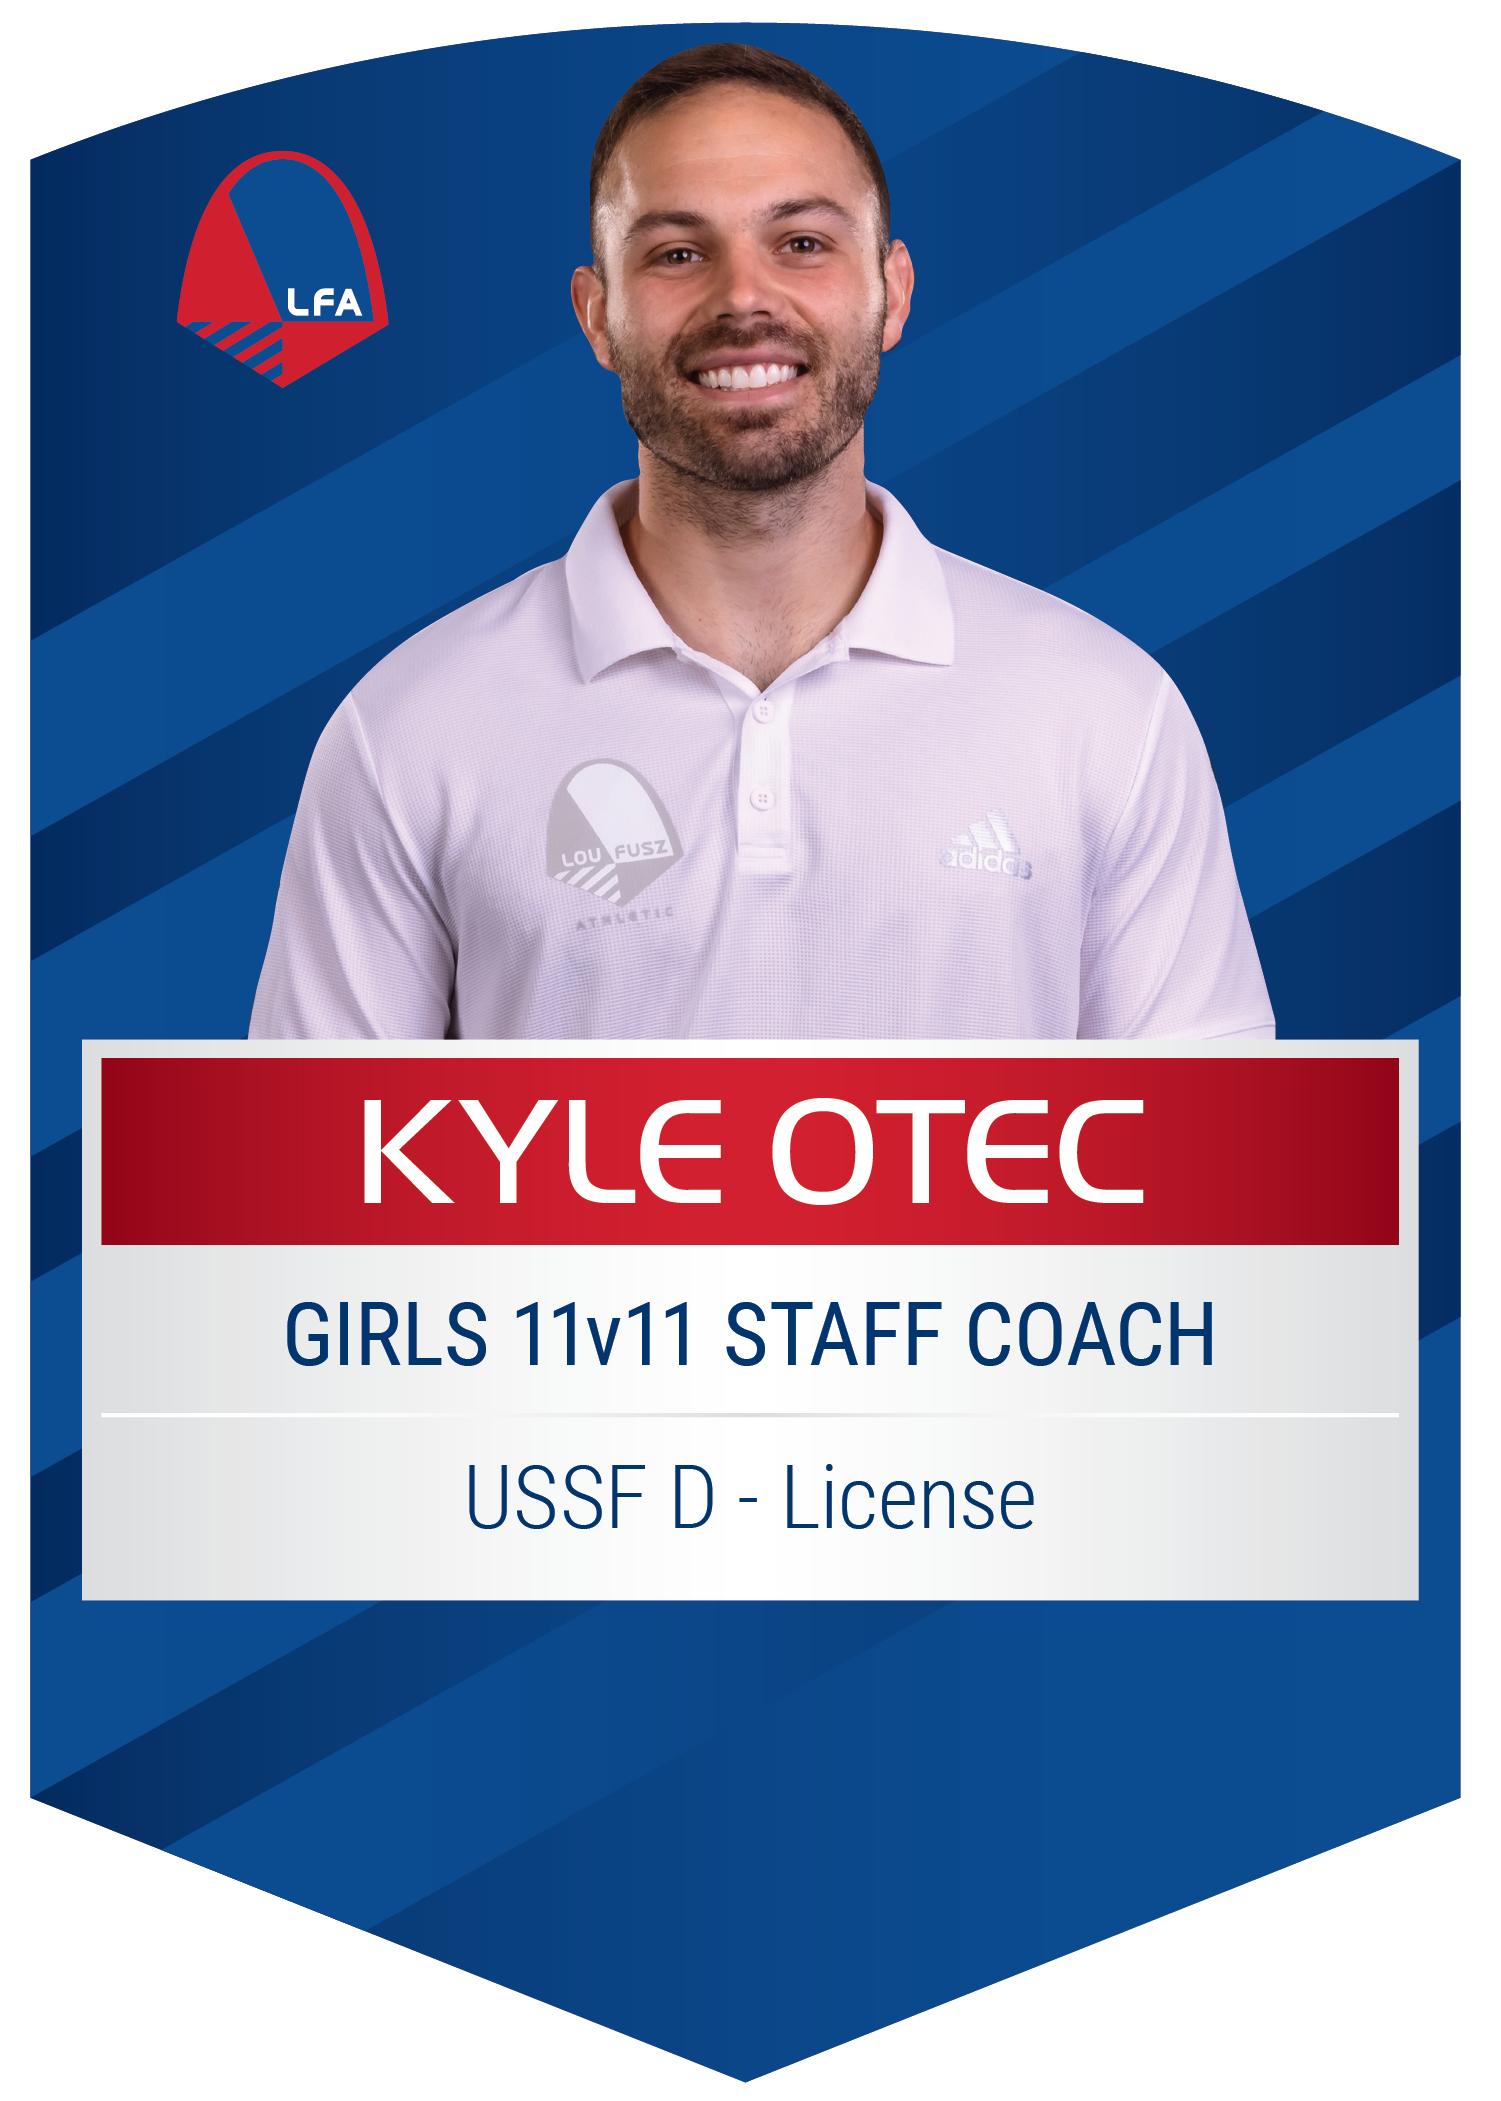 Kyle Otec